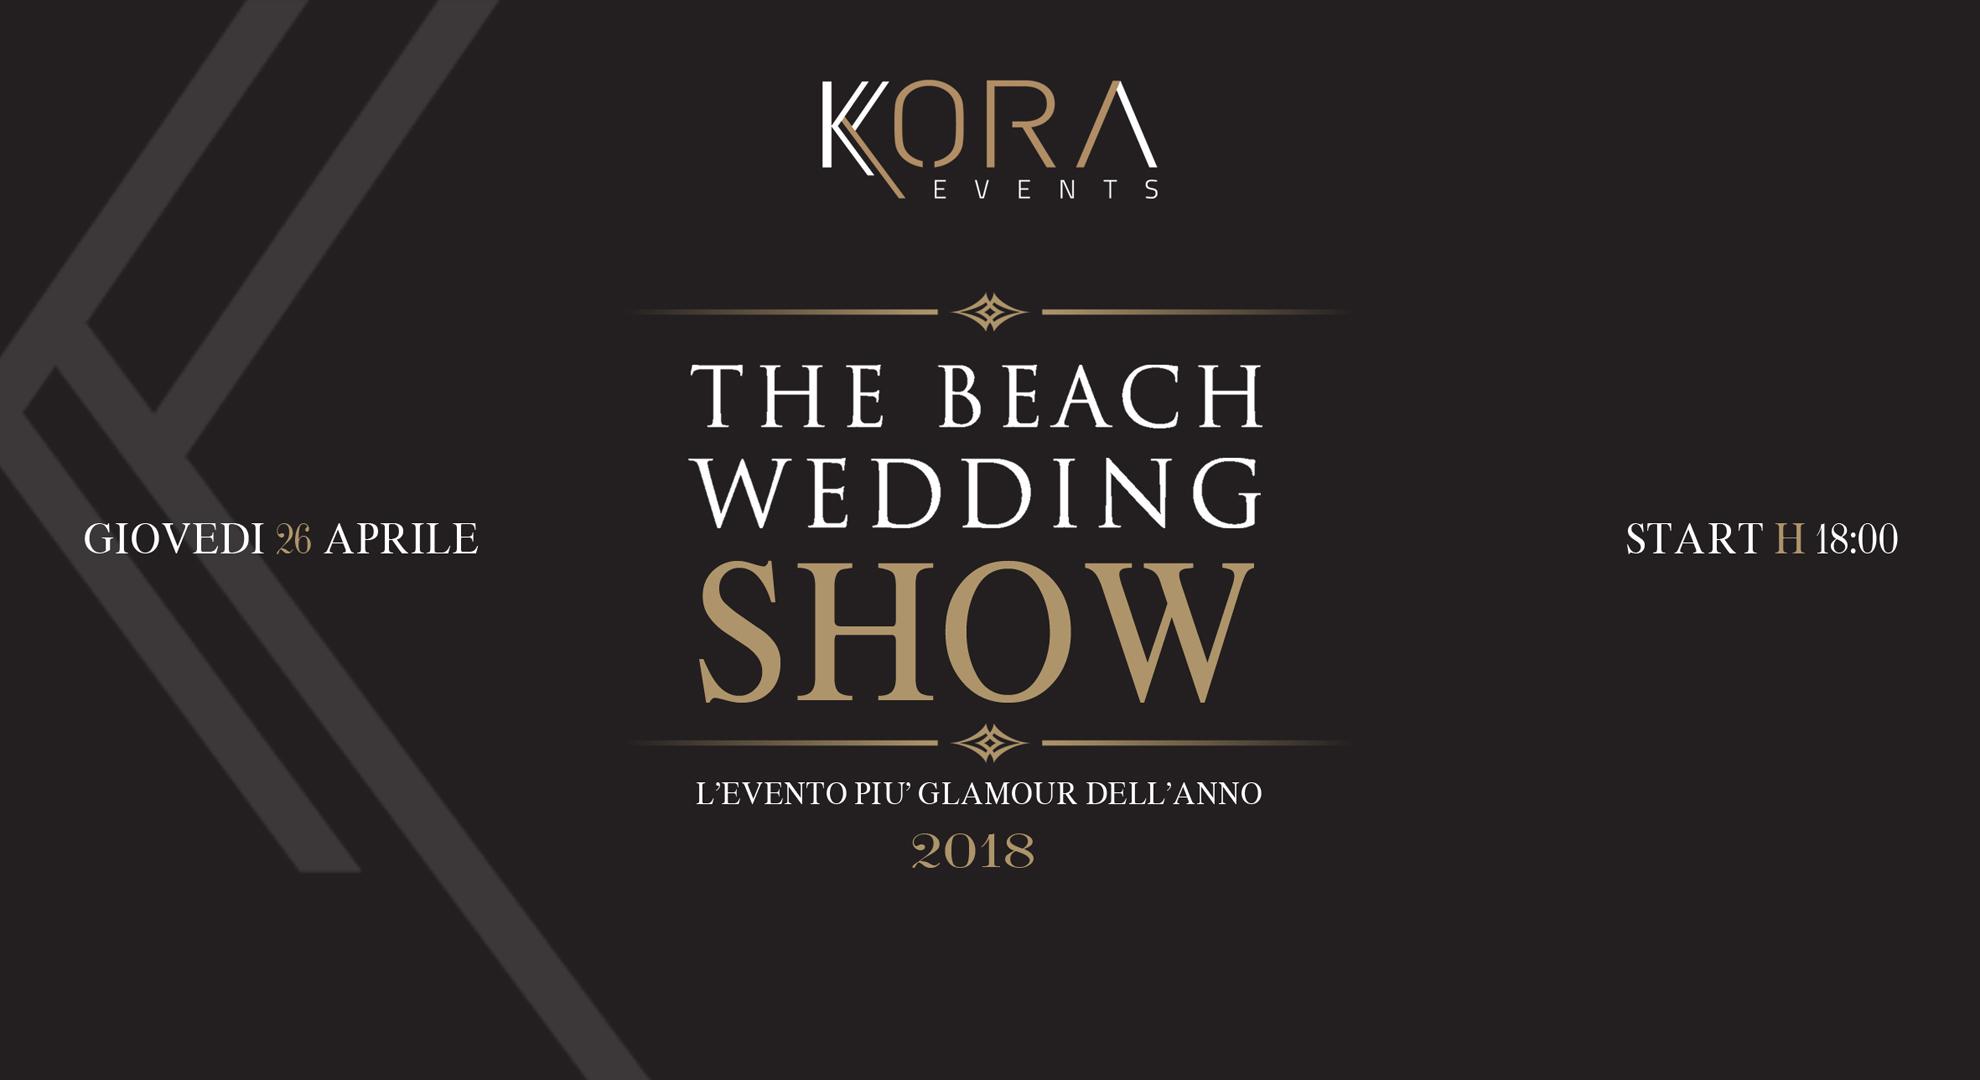 The Beach Wedding Show 2018 – 26 Aprile 2018